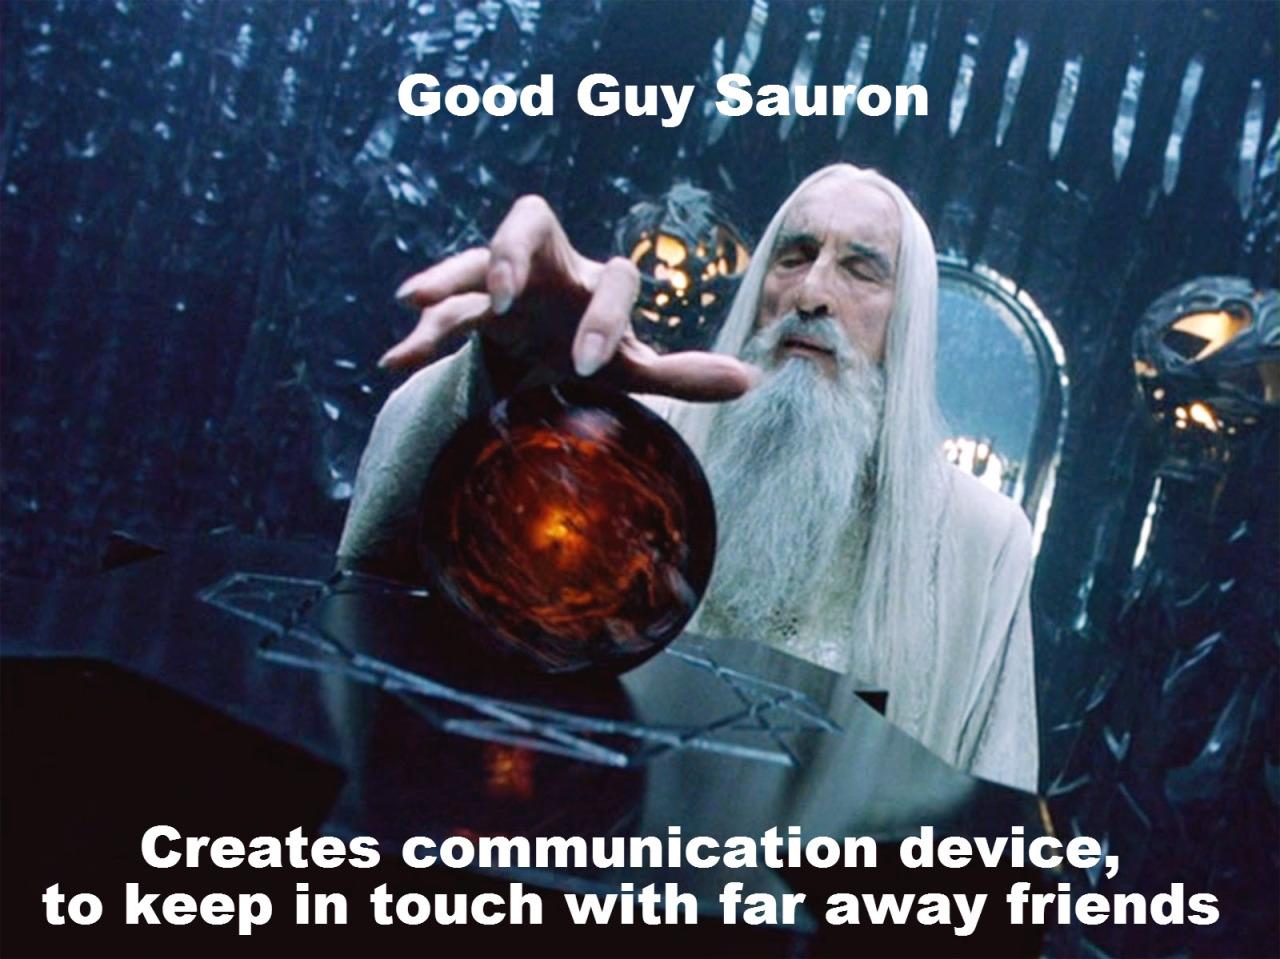 Good Guy Sauron 8